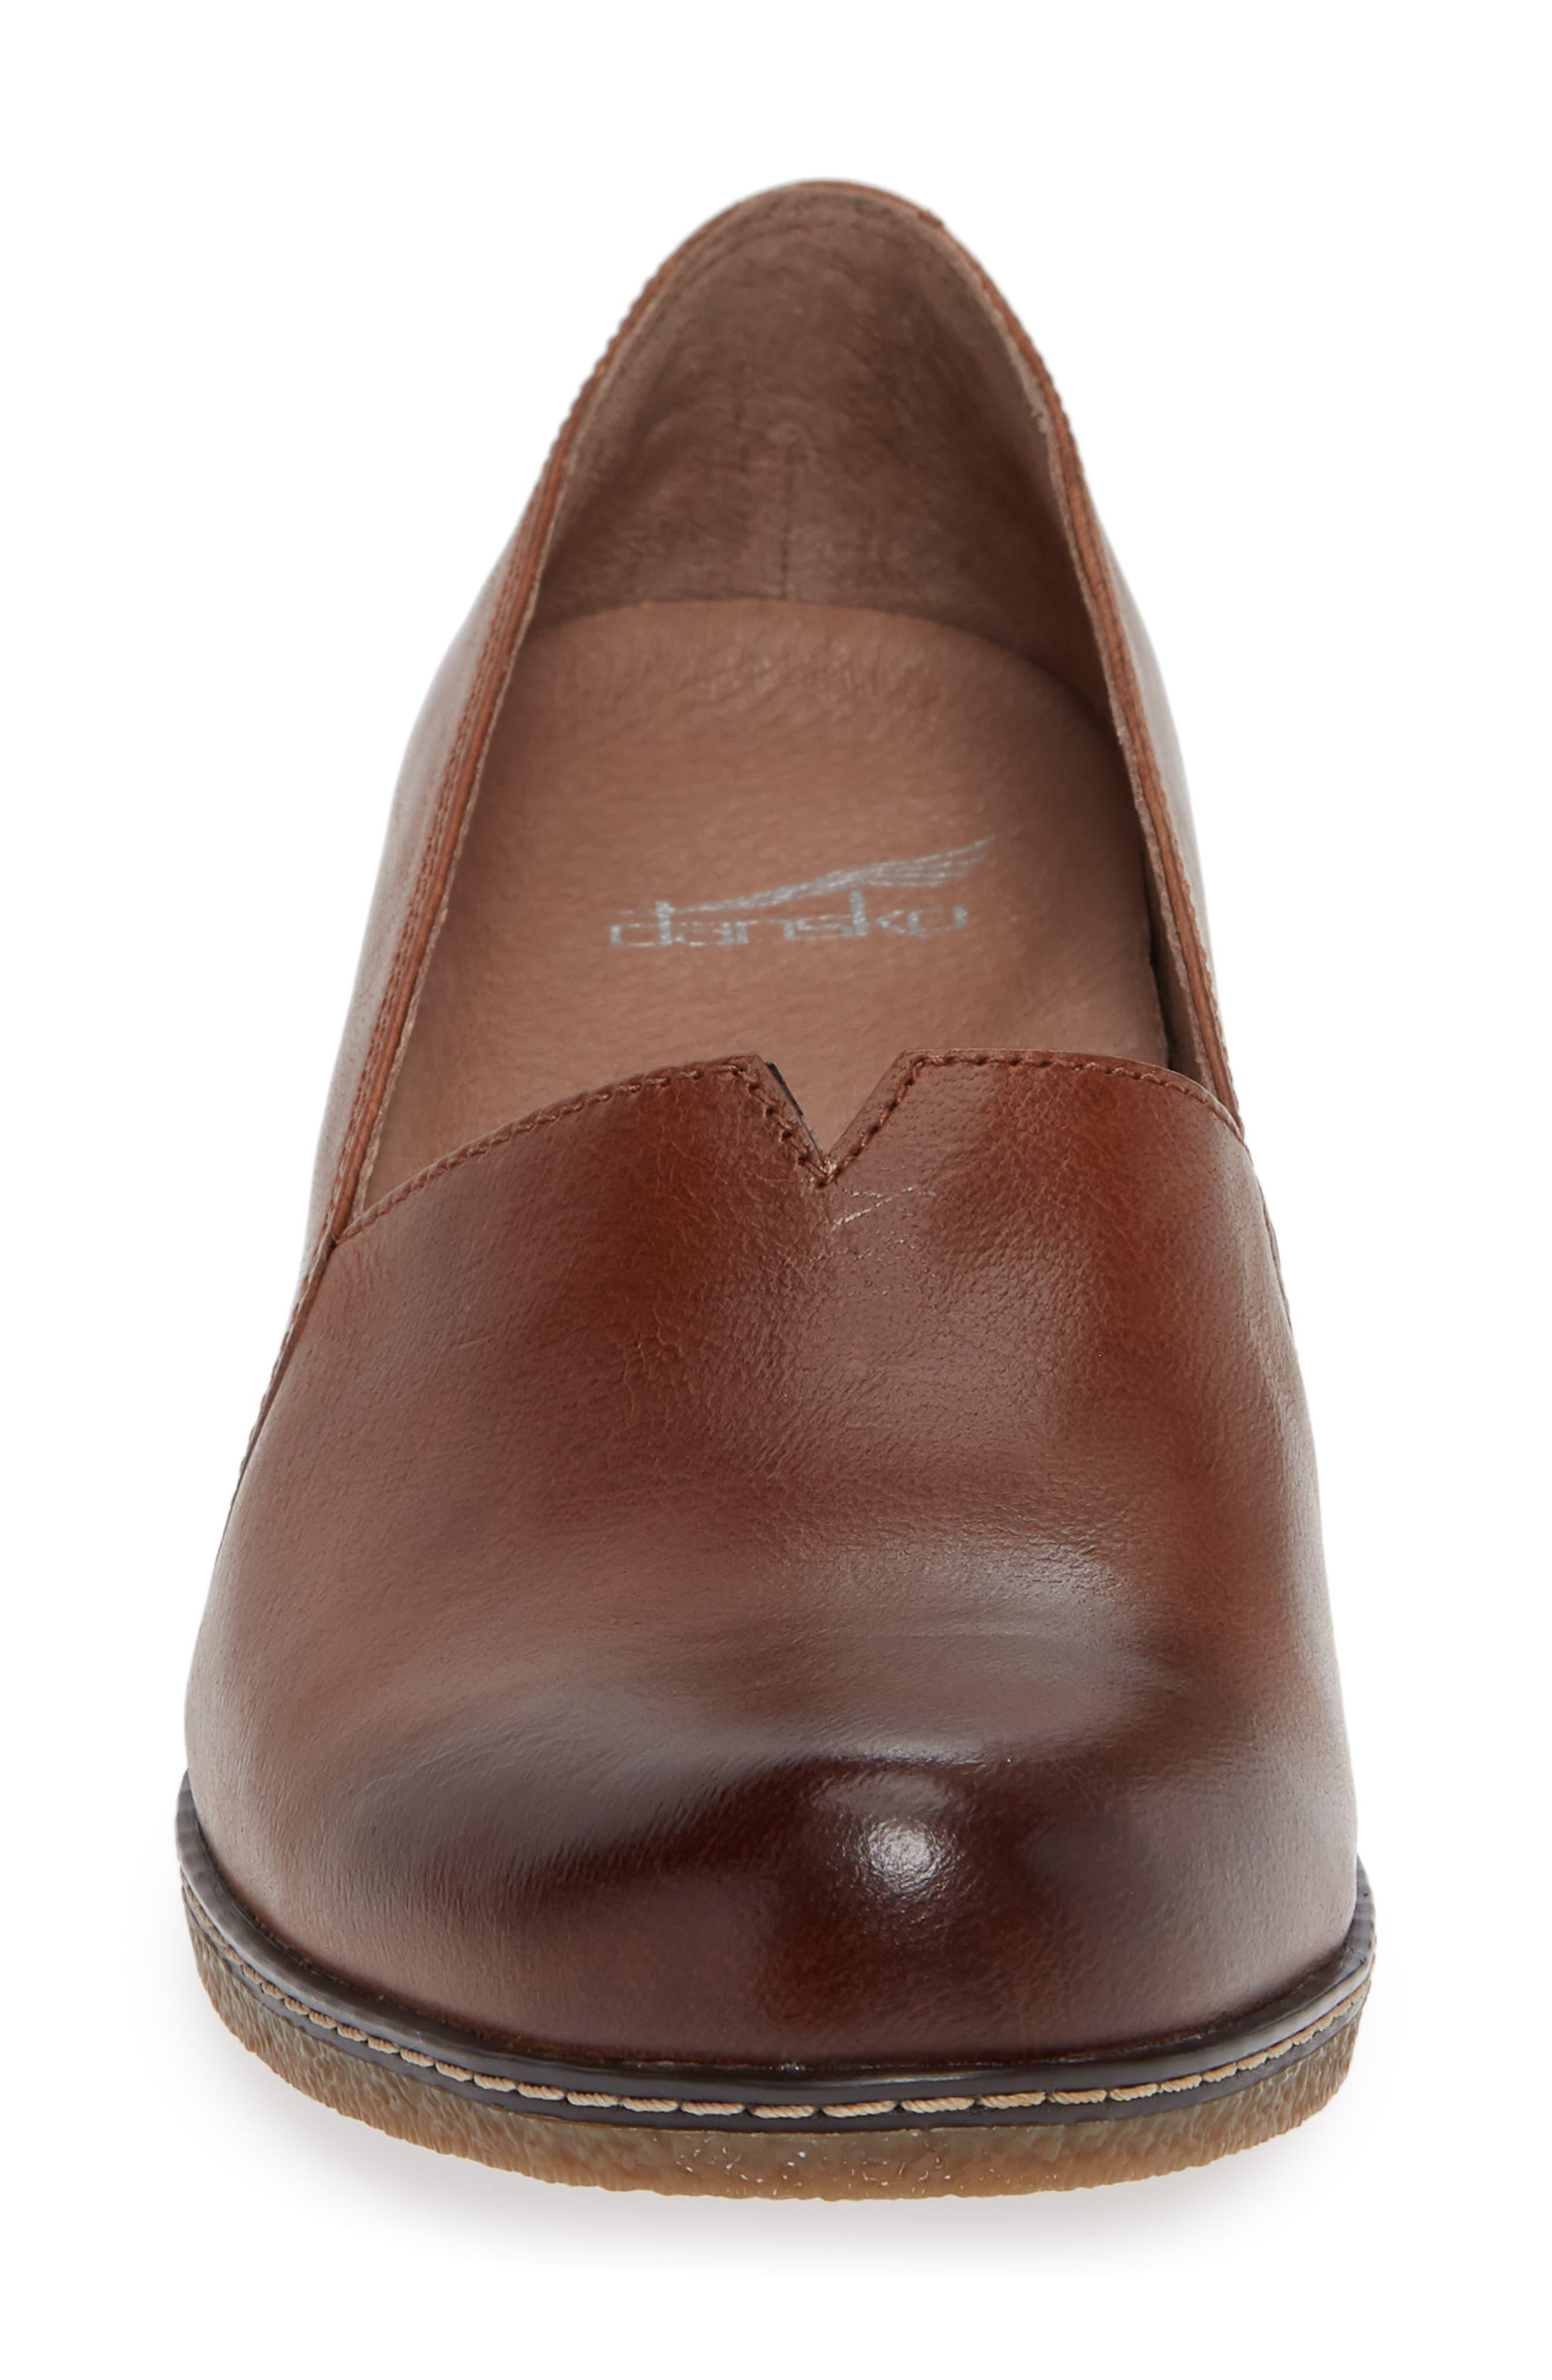 Liliana Concealed Wedge Slip-On,                             Alternate thumbnail 7, color,                             Chestnut Burnished Leather